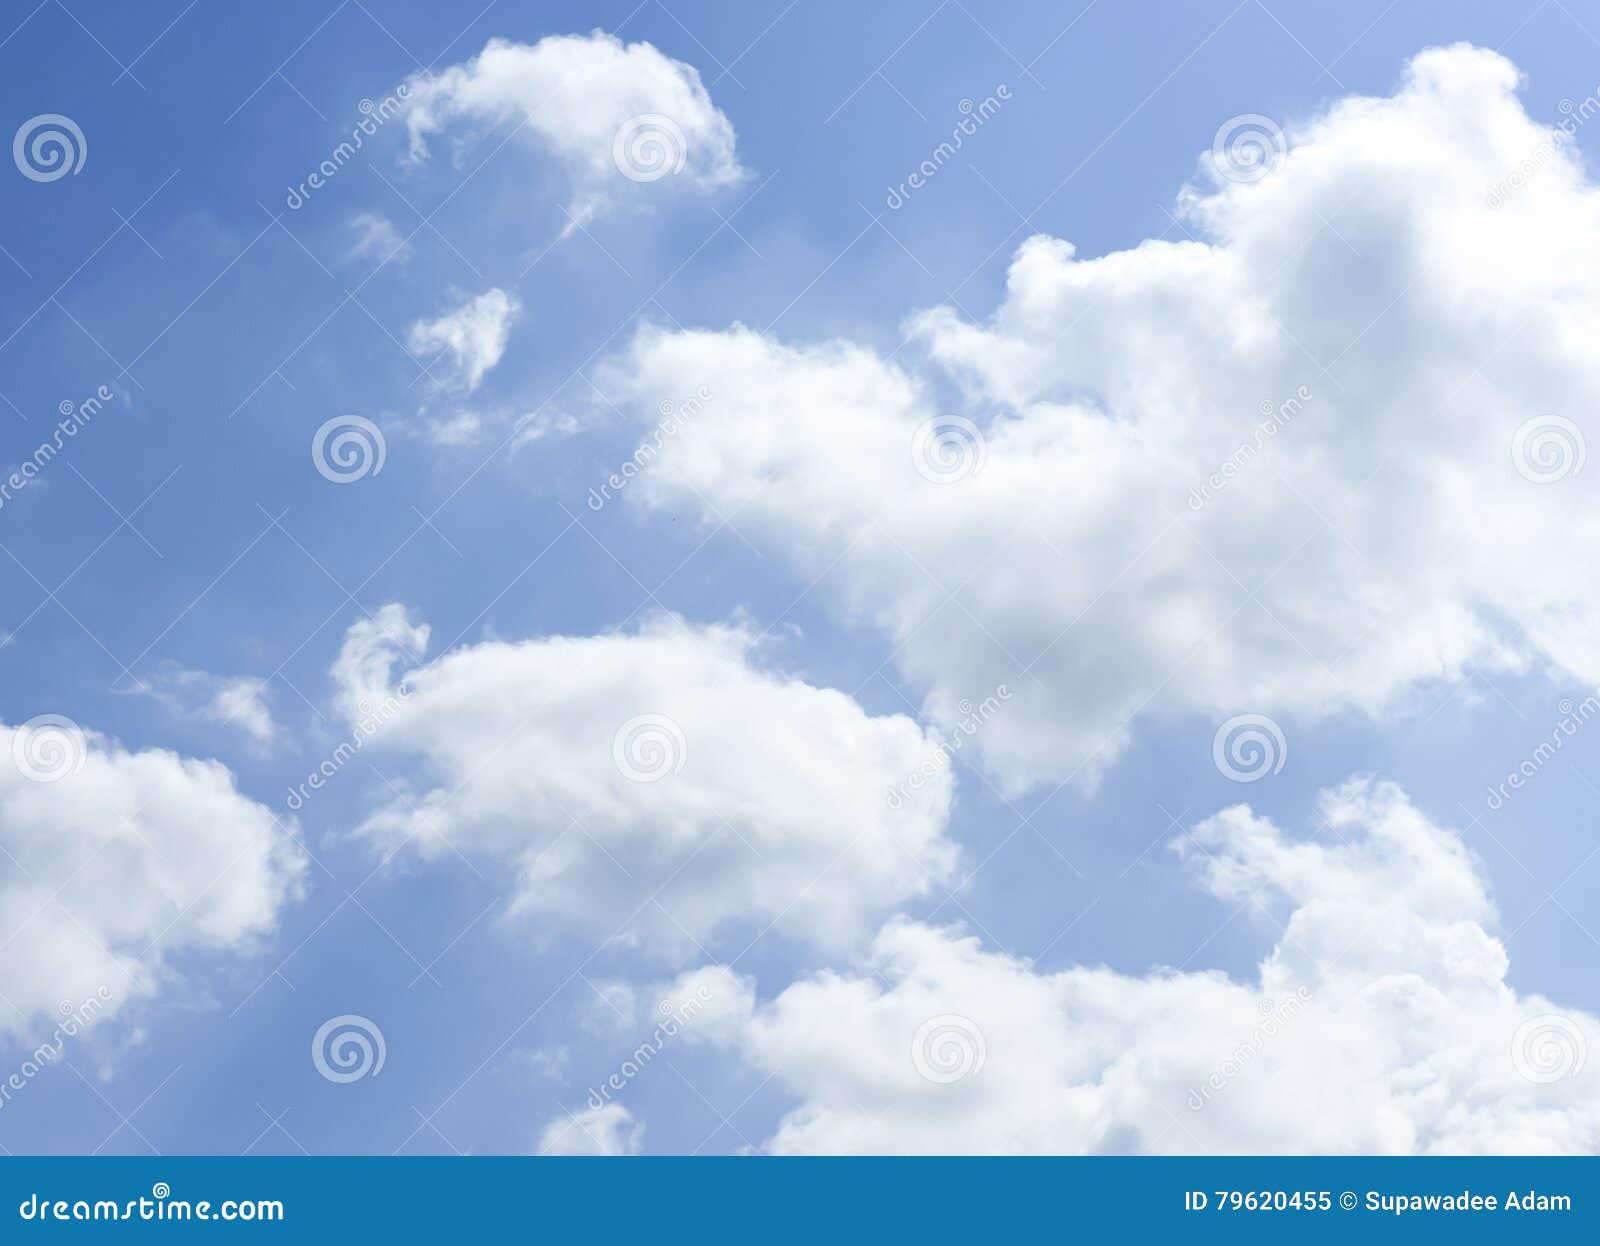 Céu azul profundo com nuvem